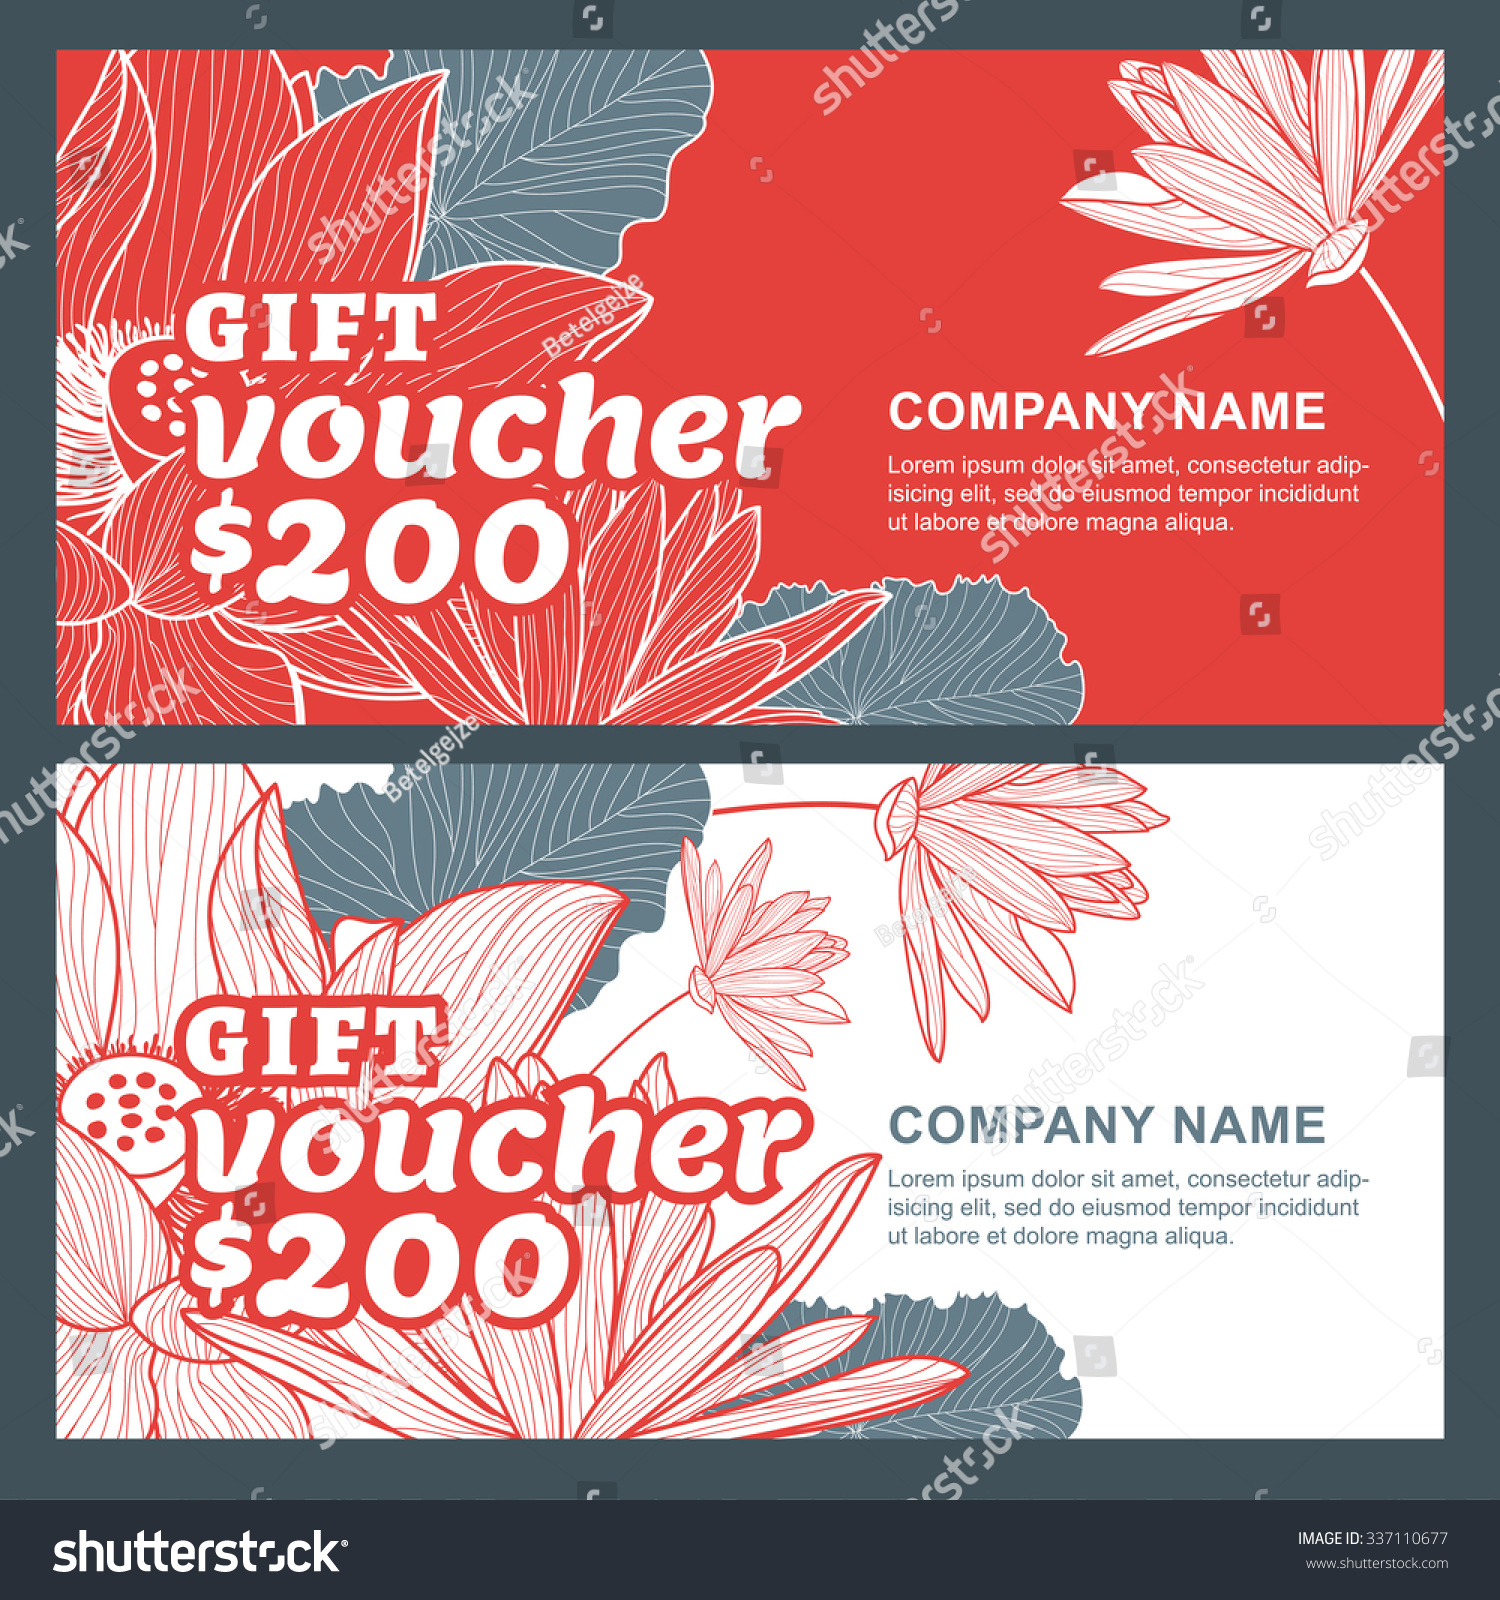 vector t voucher lotus lily flowers stock vector